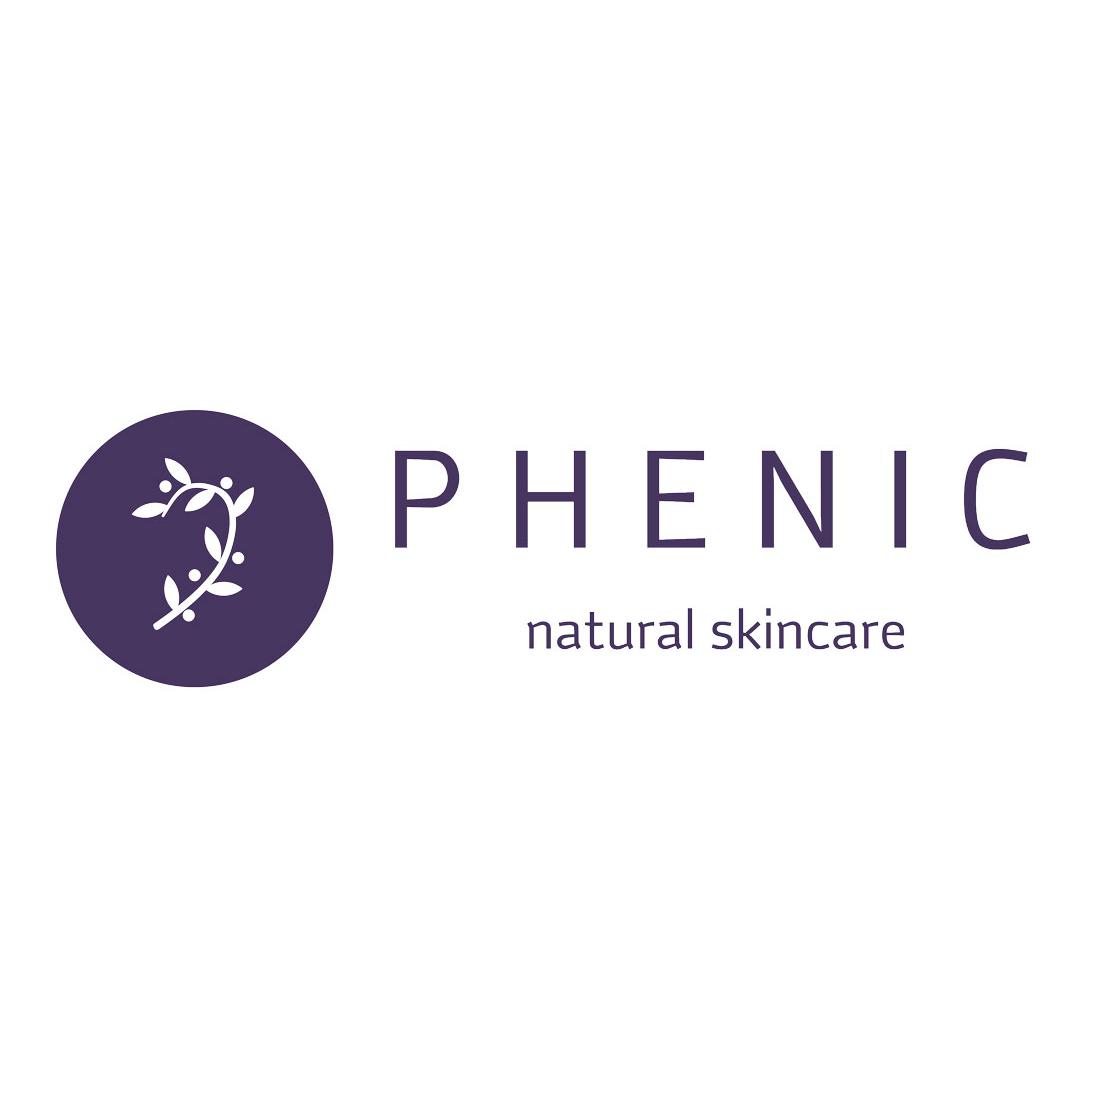 Phenic Natural Skincare, MA